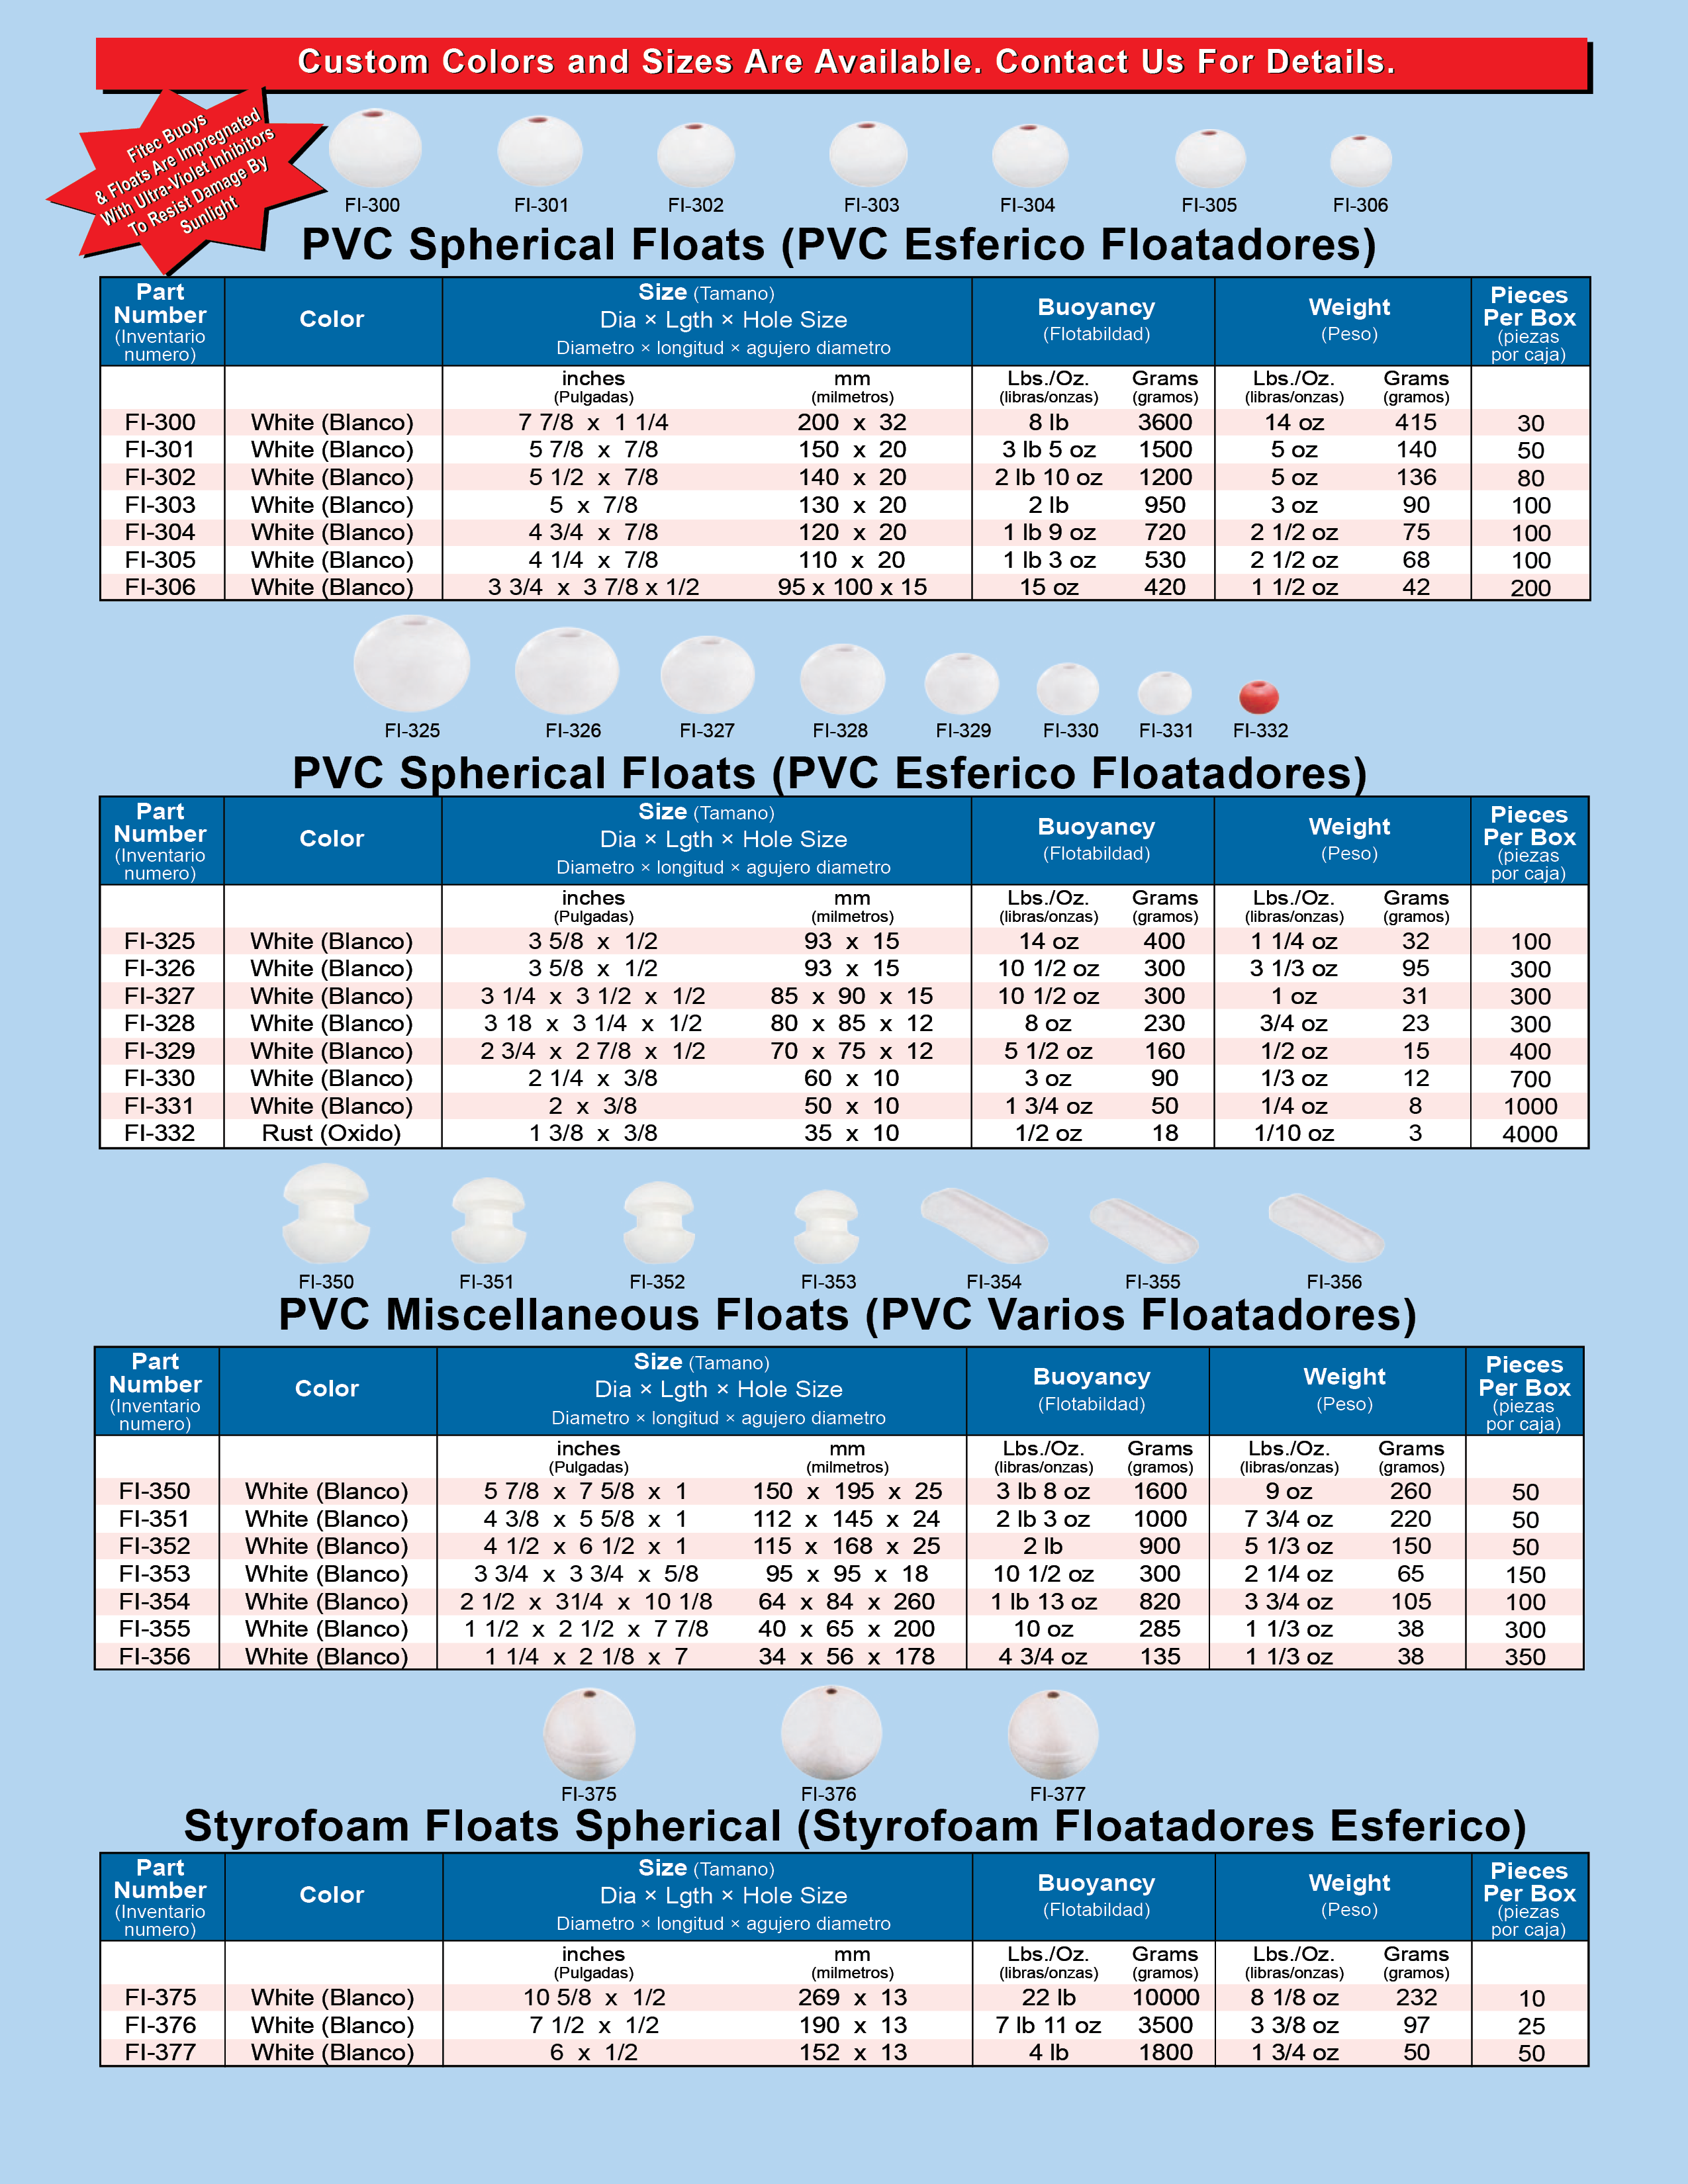 PVC Spherical Floats